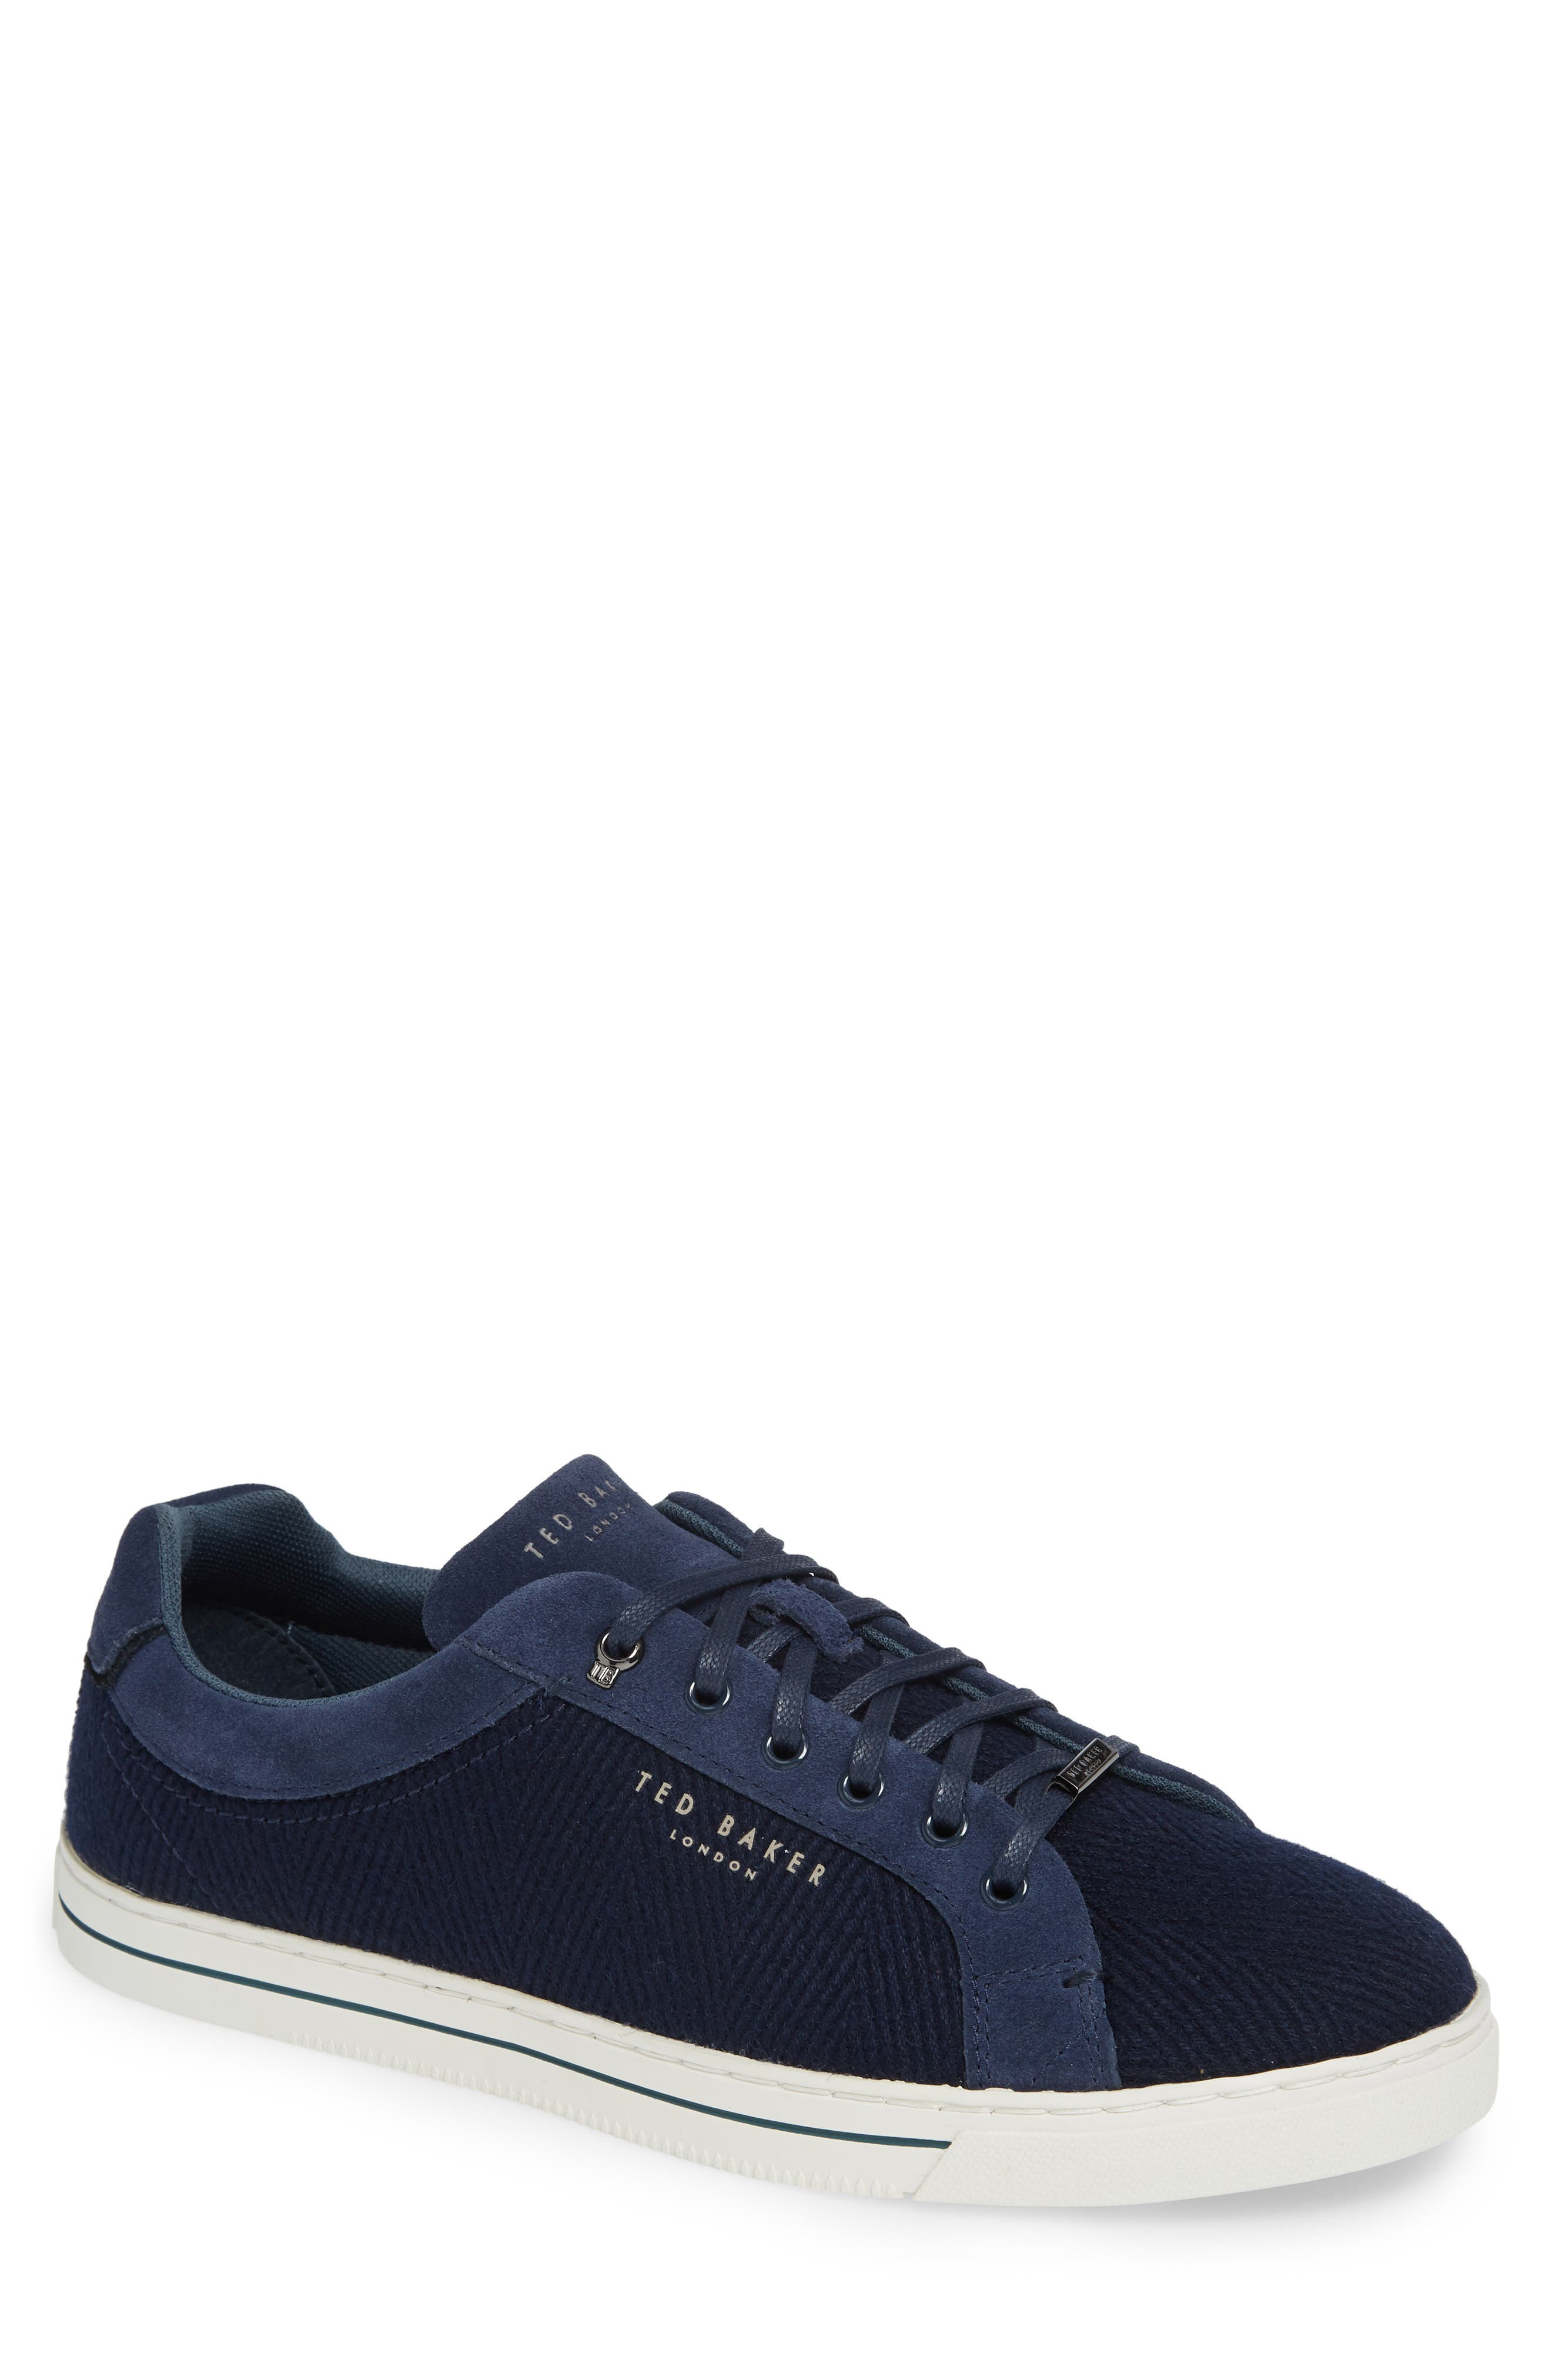 Ted Baker London Werill Sneaker, Blue